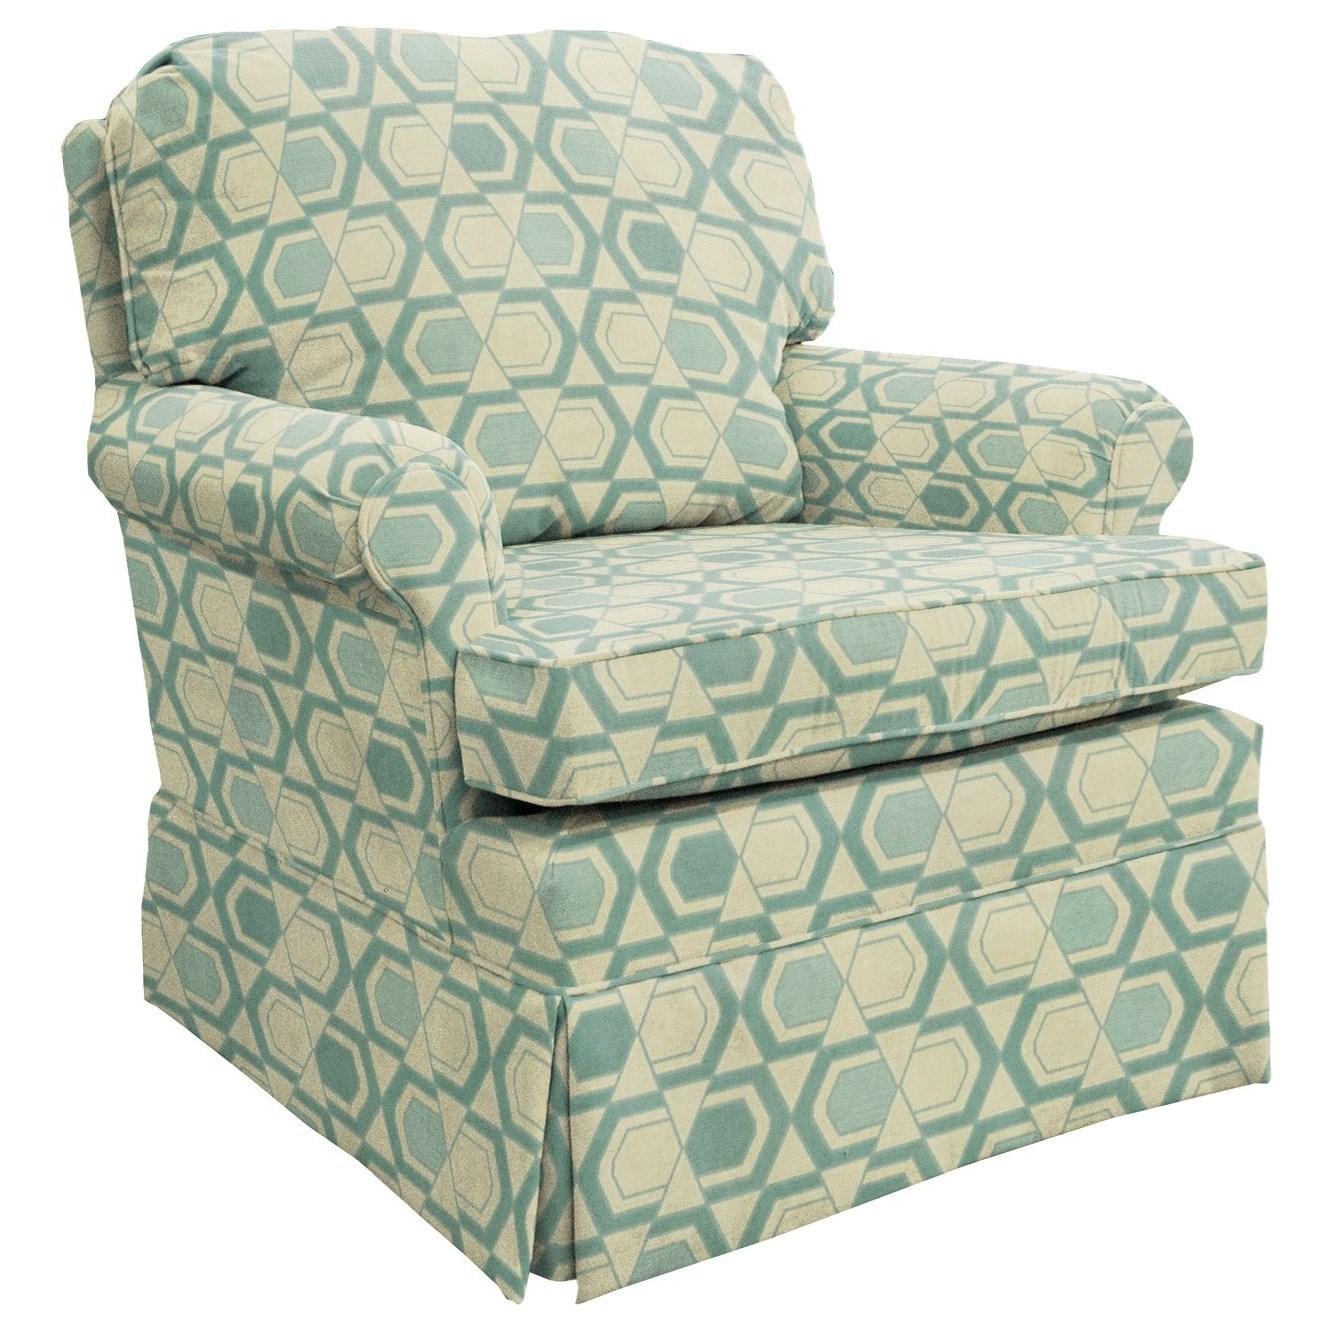 Best Home Furnishings Patoka Glider Club Chair - Item Number: 2616-30562